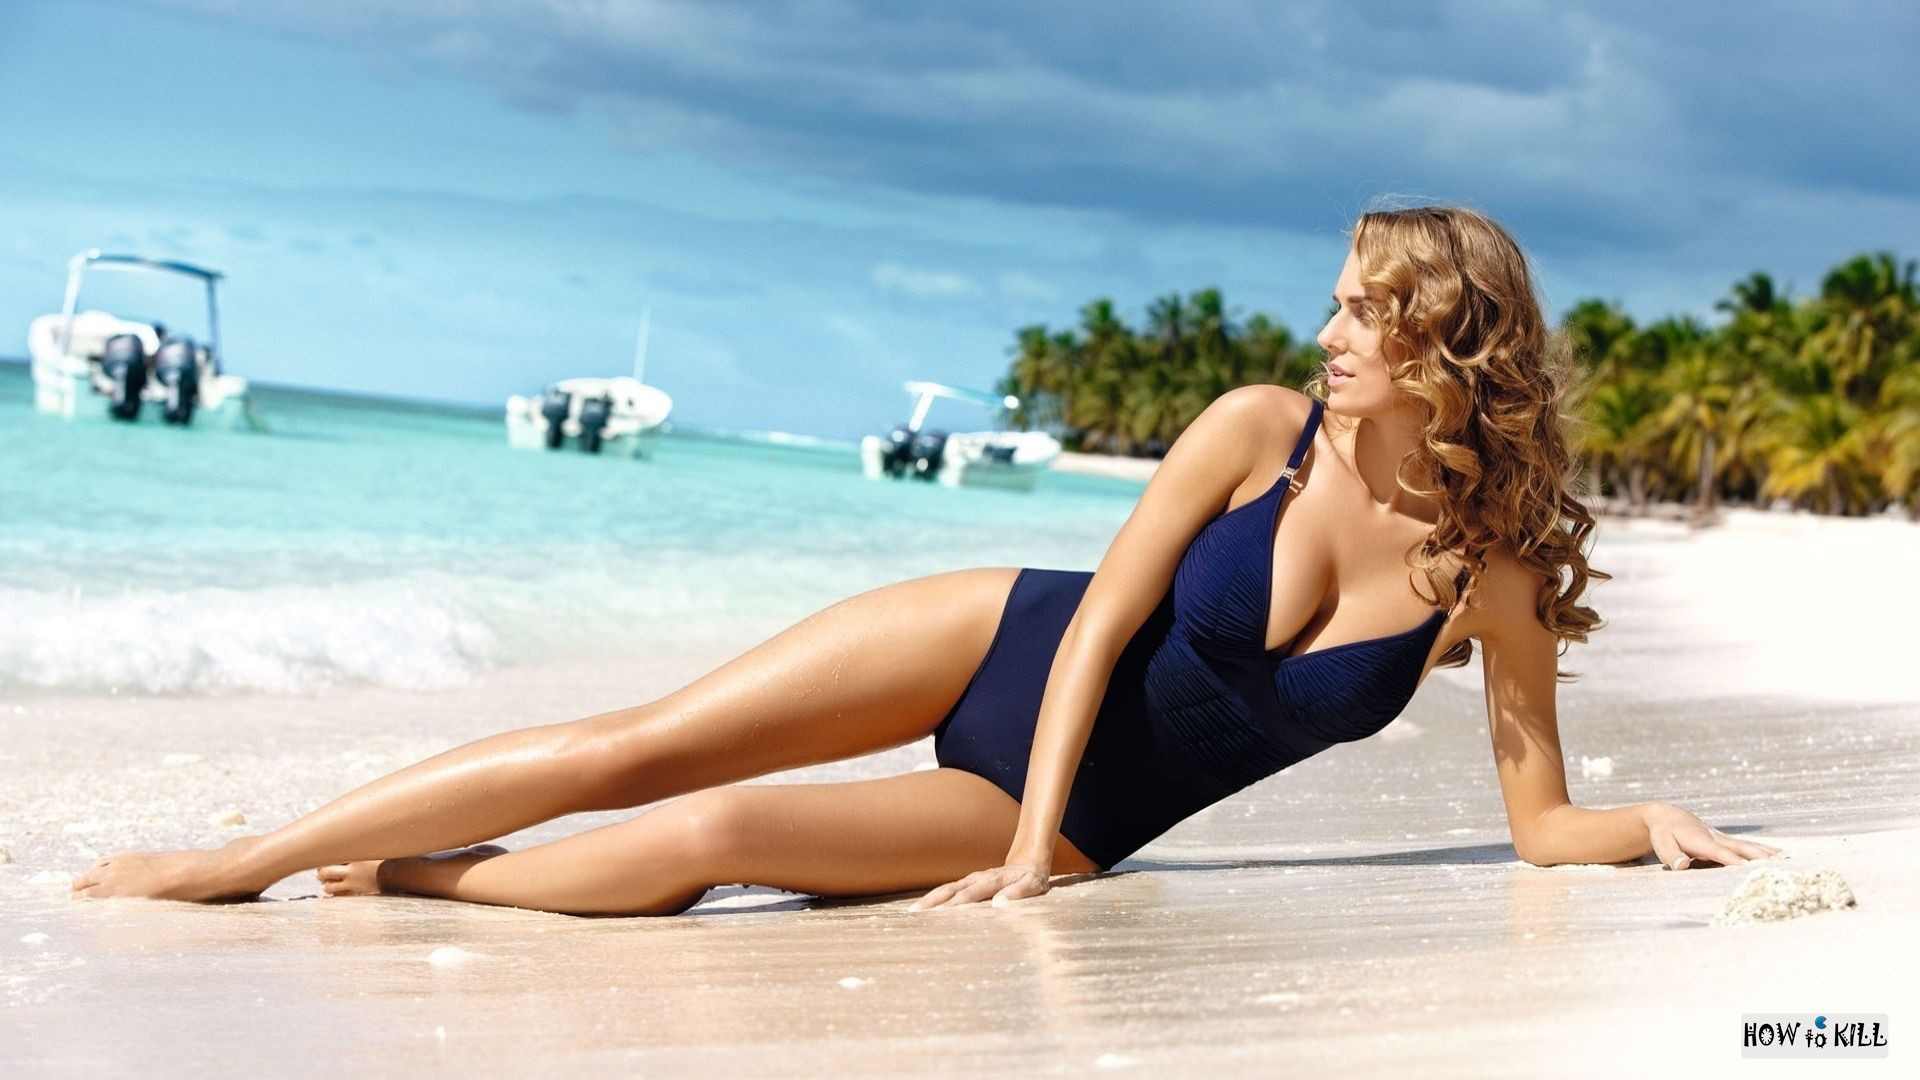 Красивое фото девушек пляже